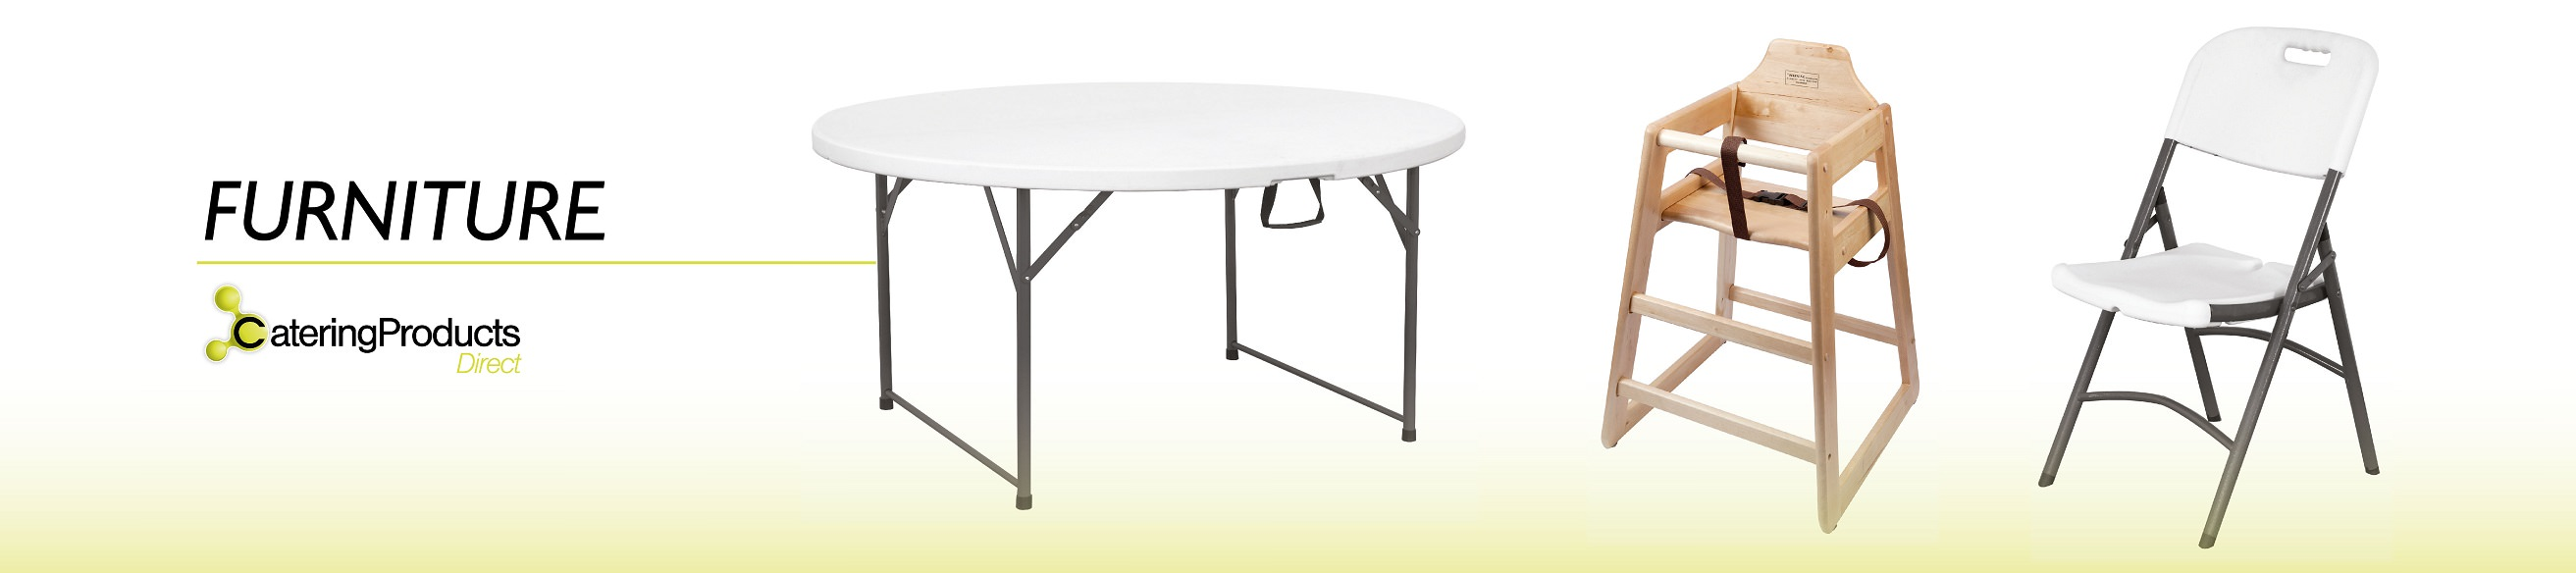 Furniture-01 II